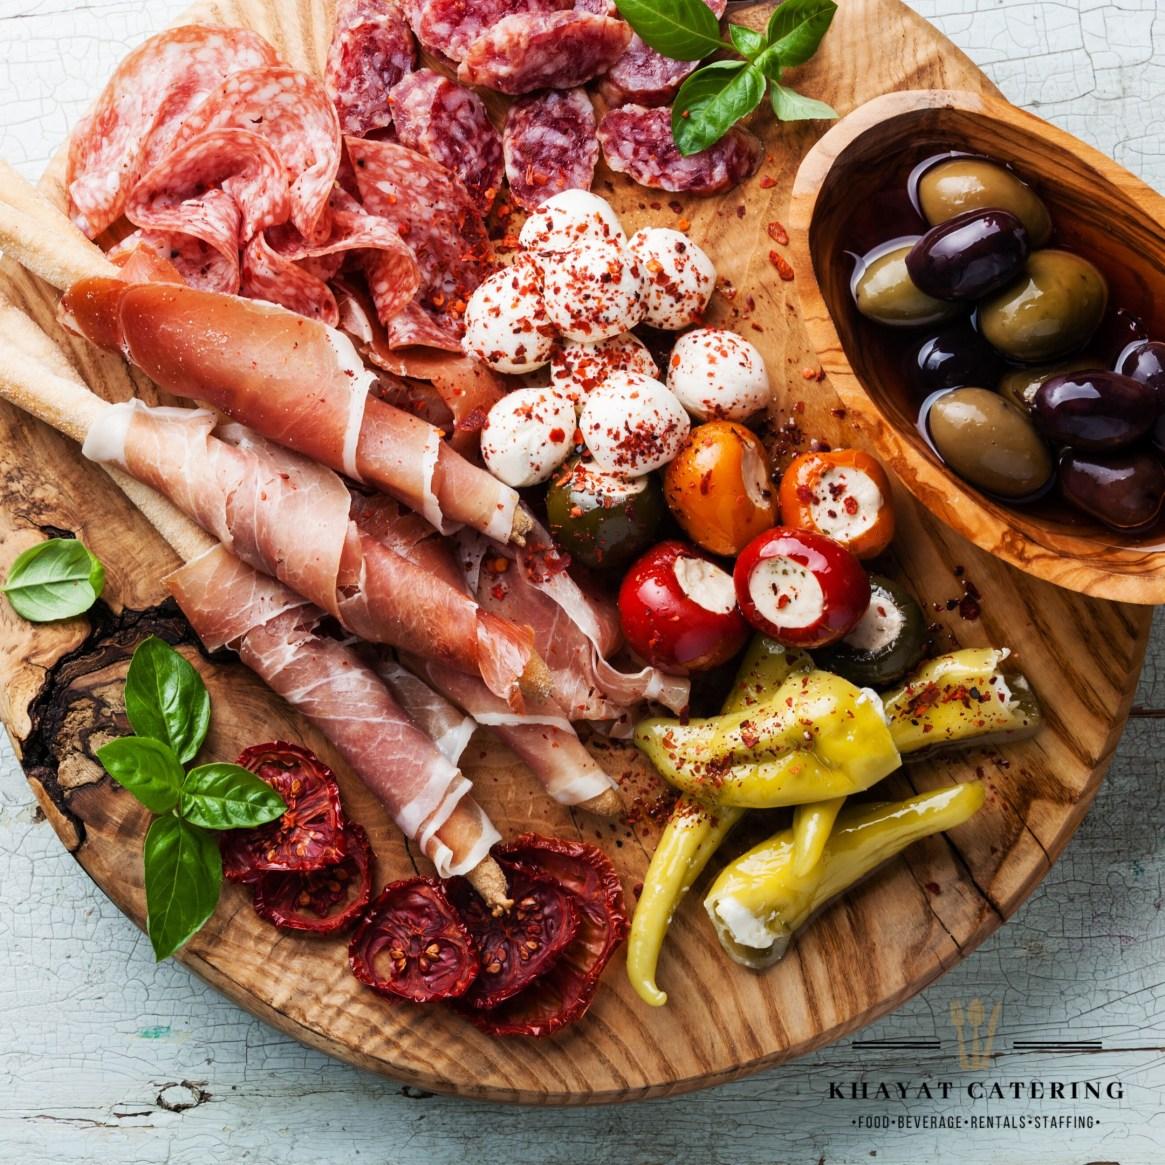 Khayat Catering antipasto platter